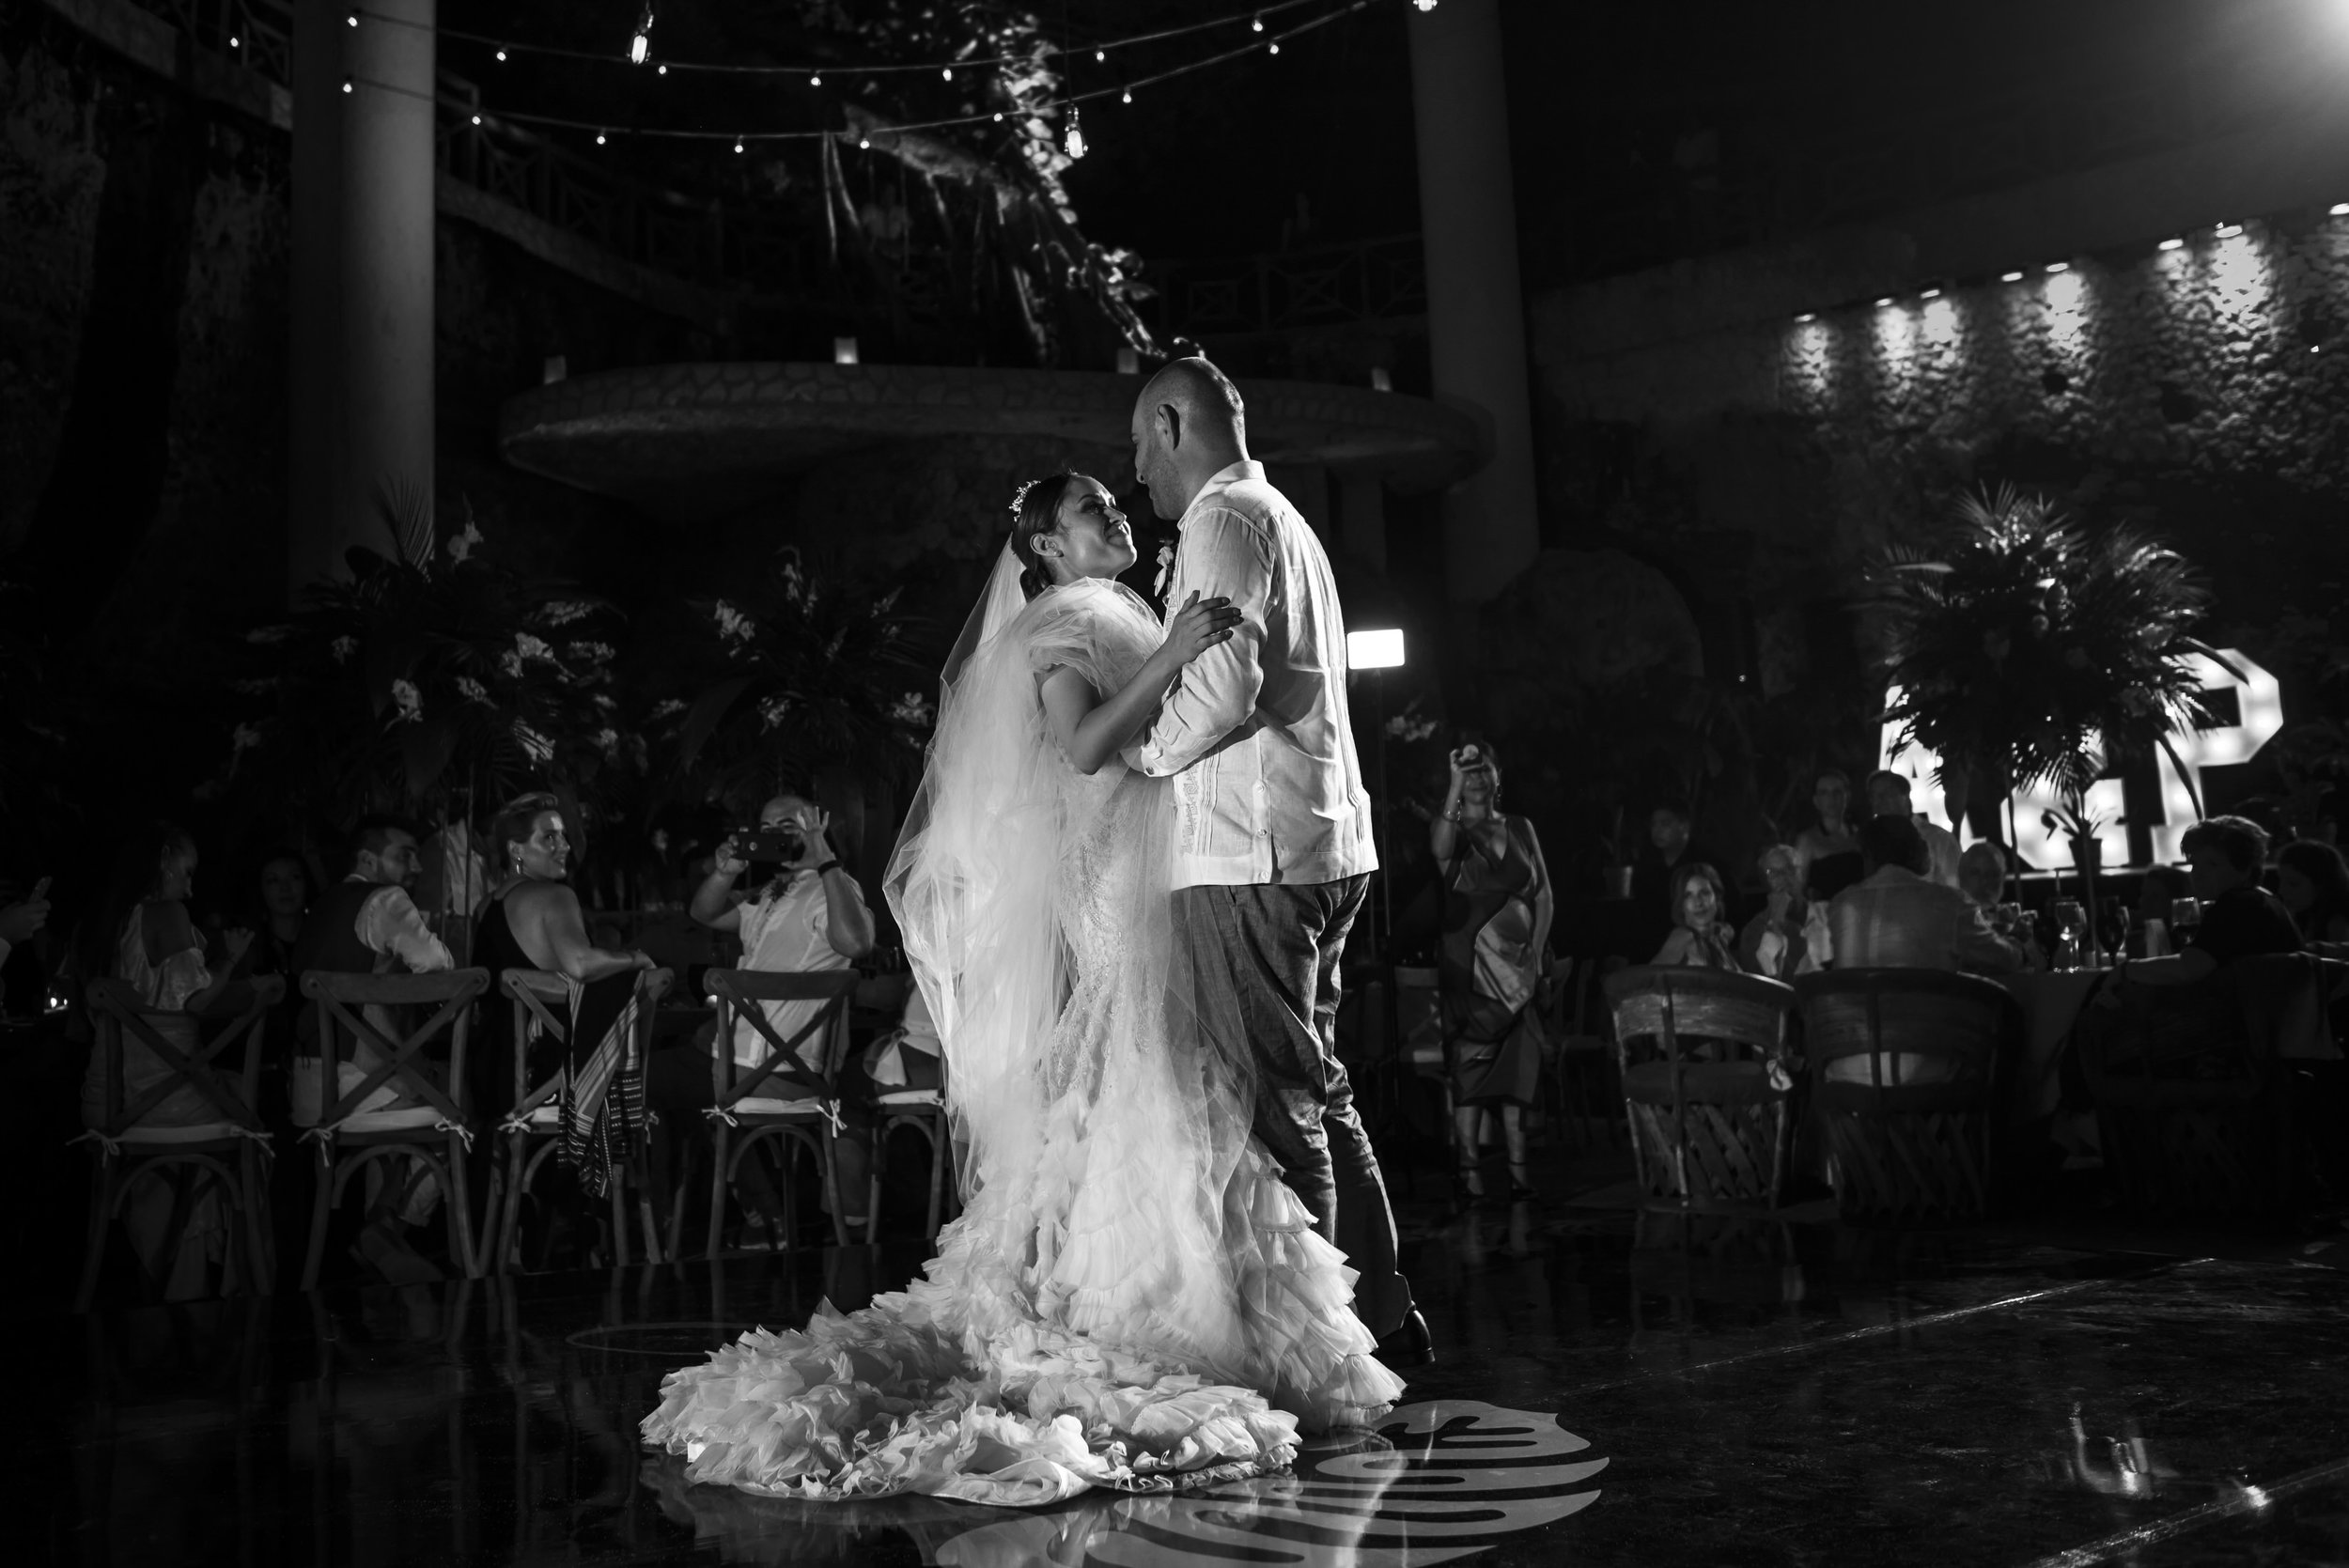 cancun_wedding_photographer_mexico (80).jpg